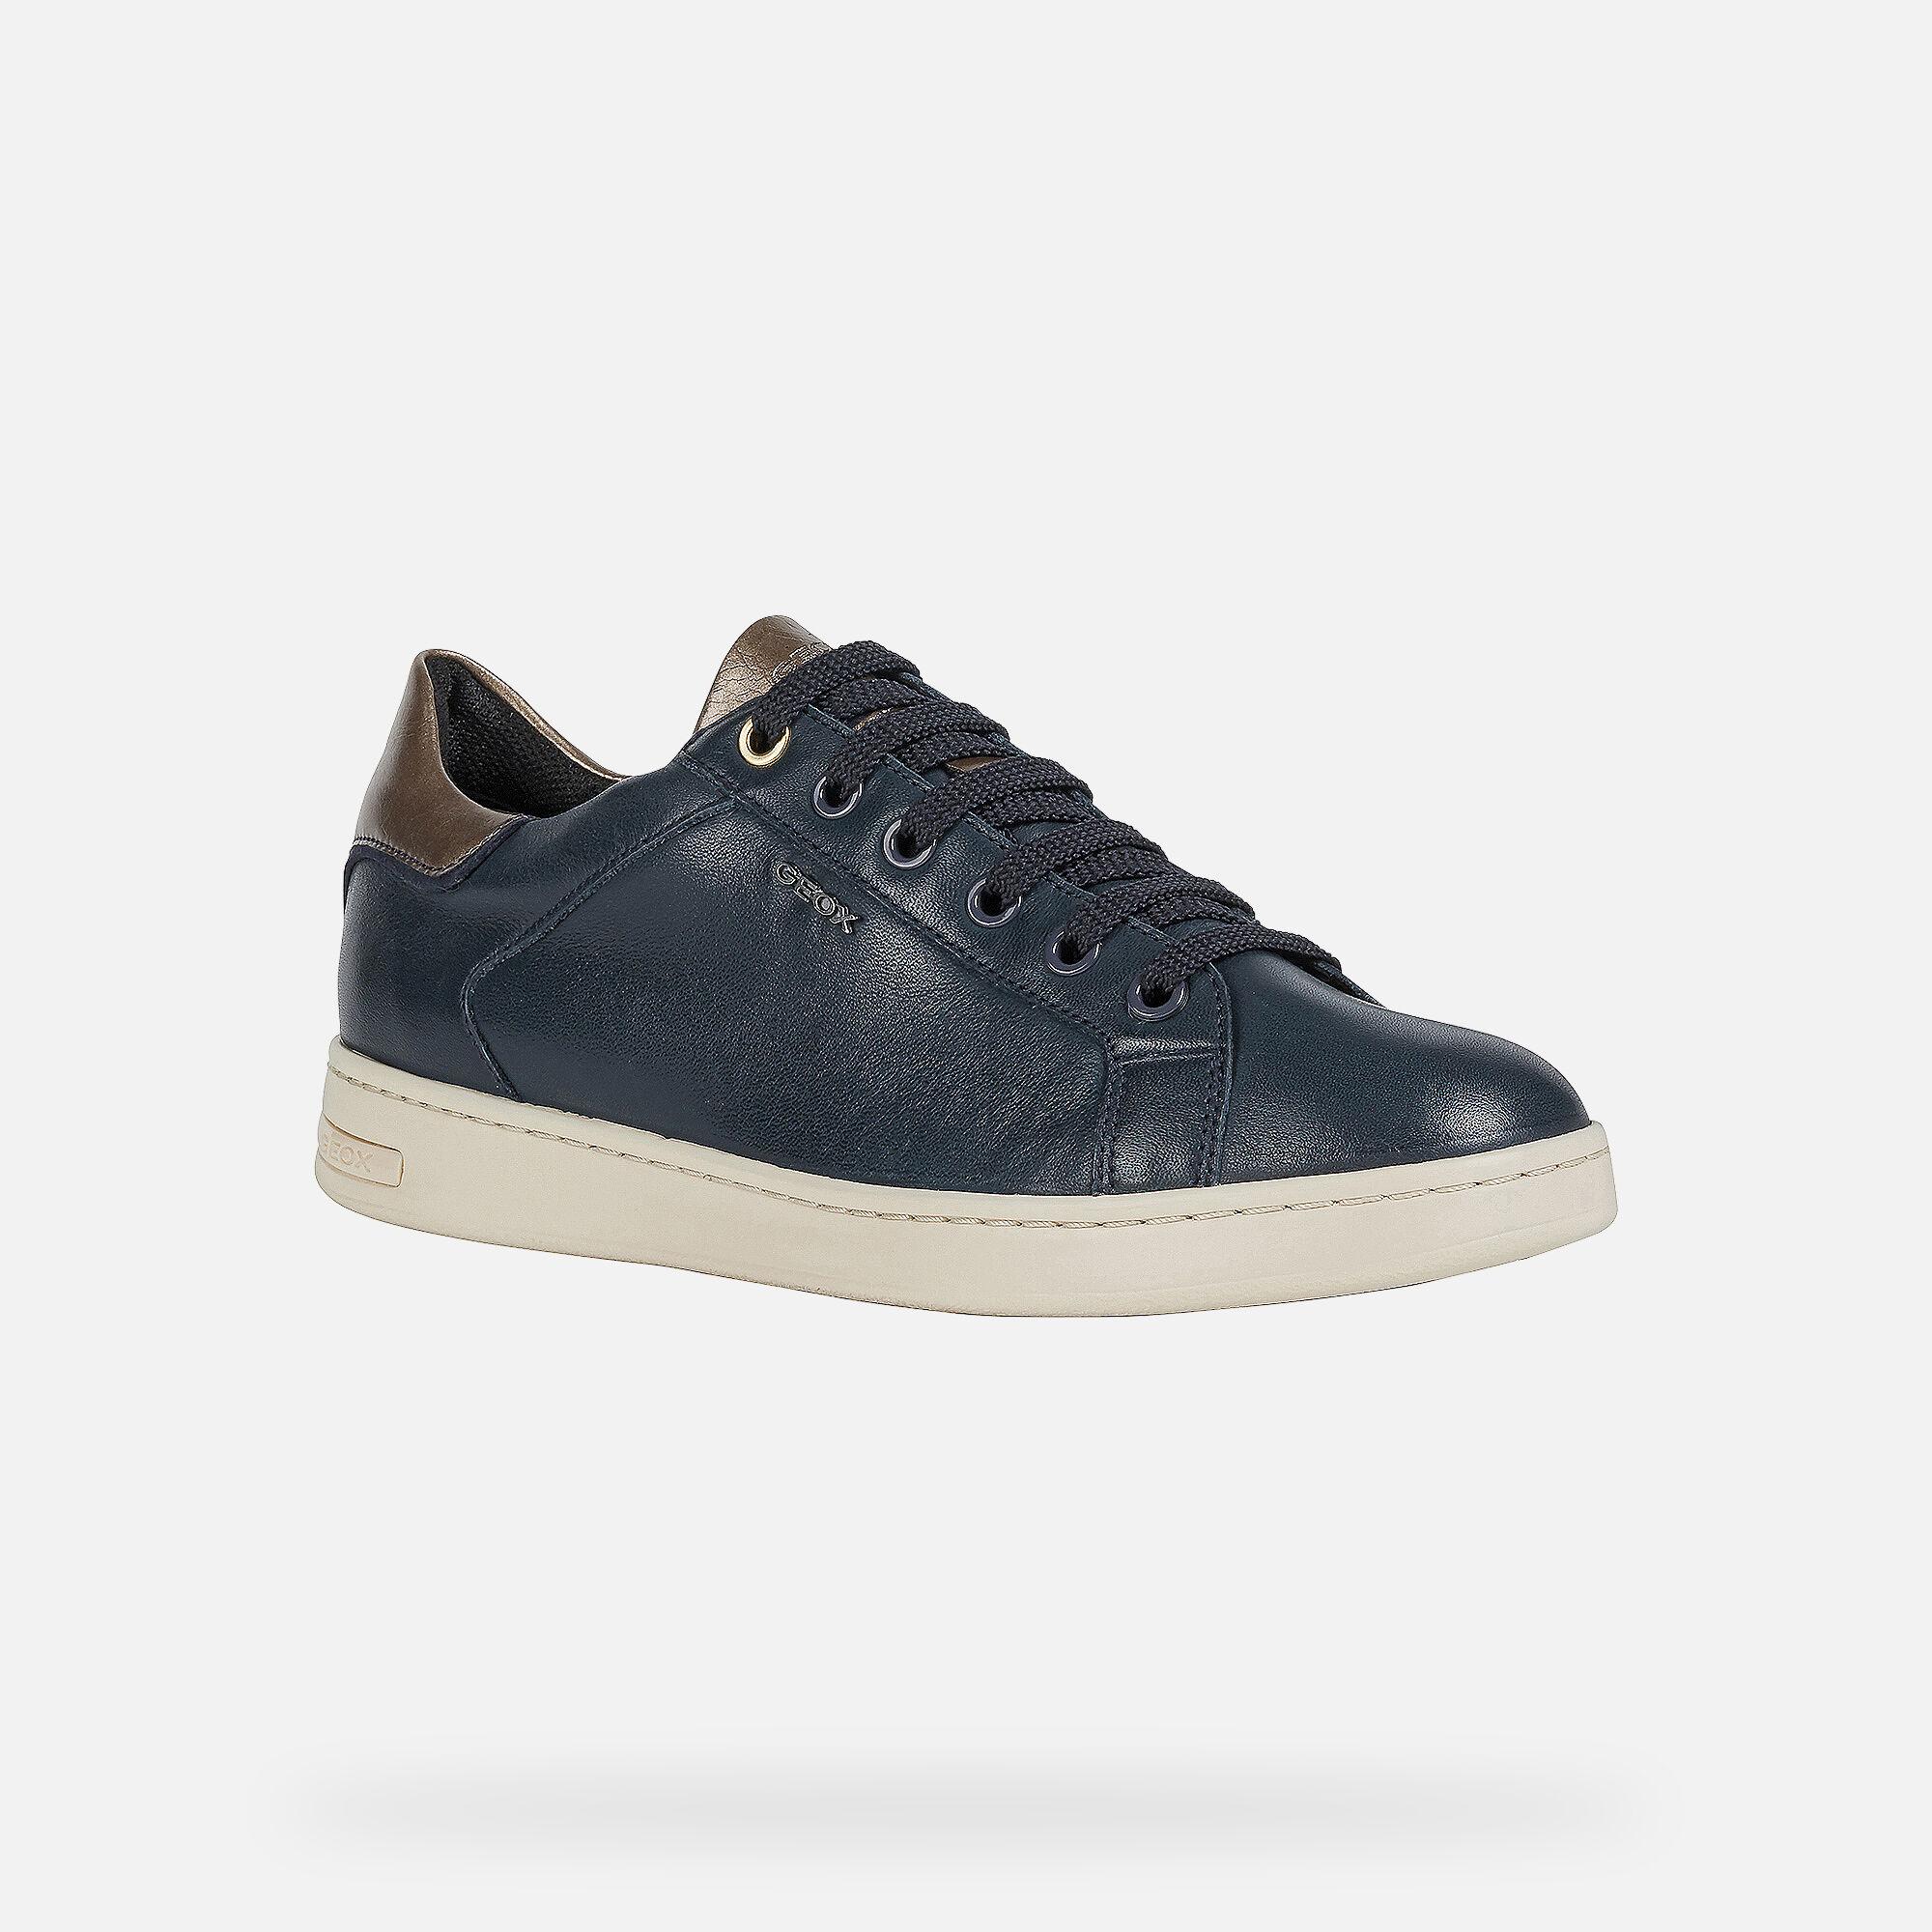 Geox JAYSEN Woman: Navy blue Sneakers